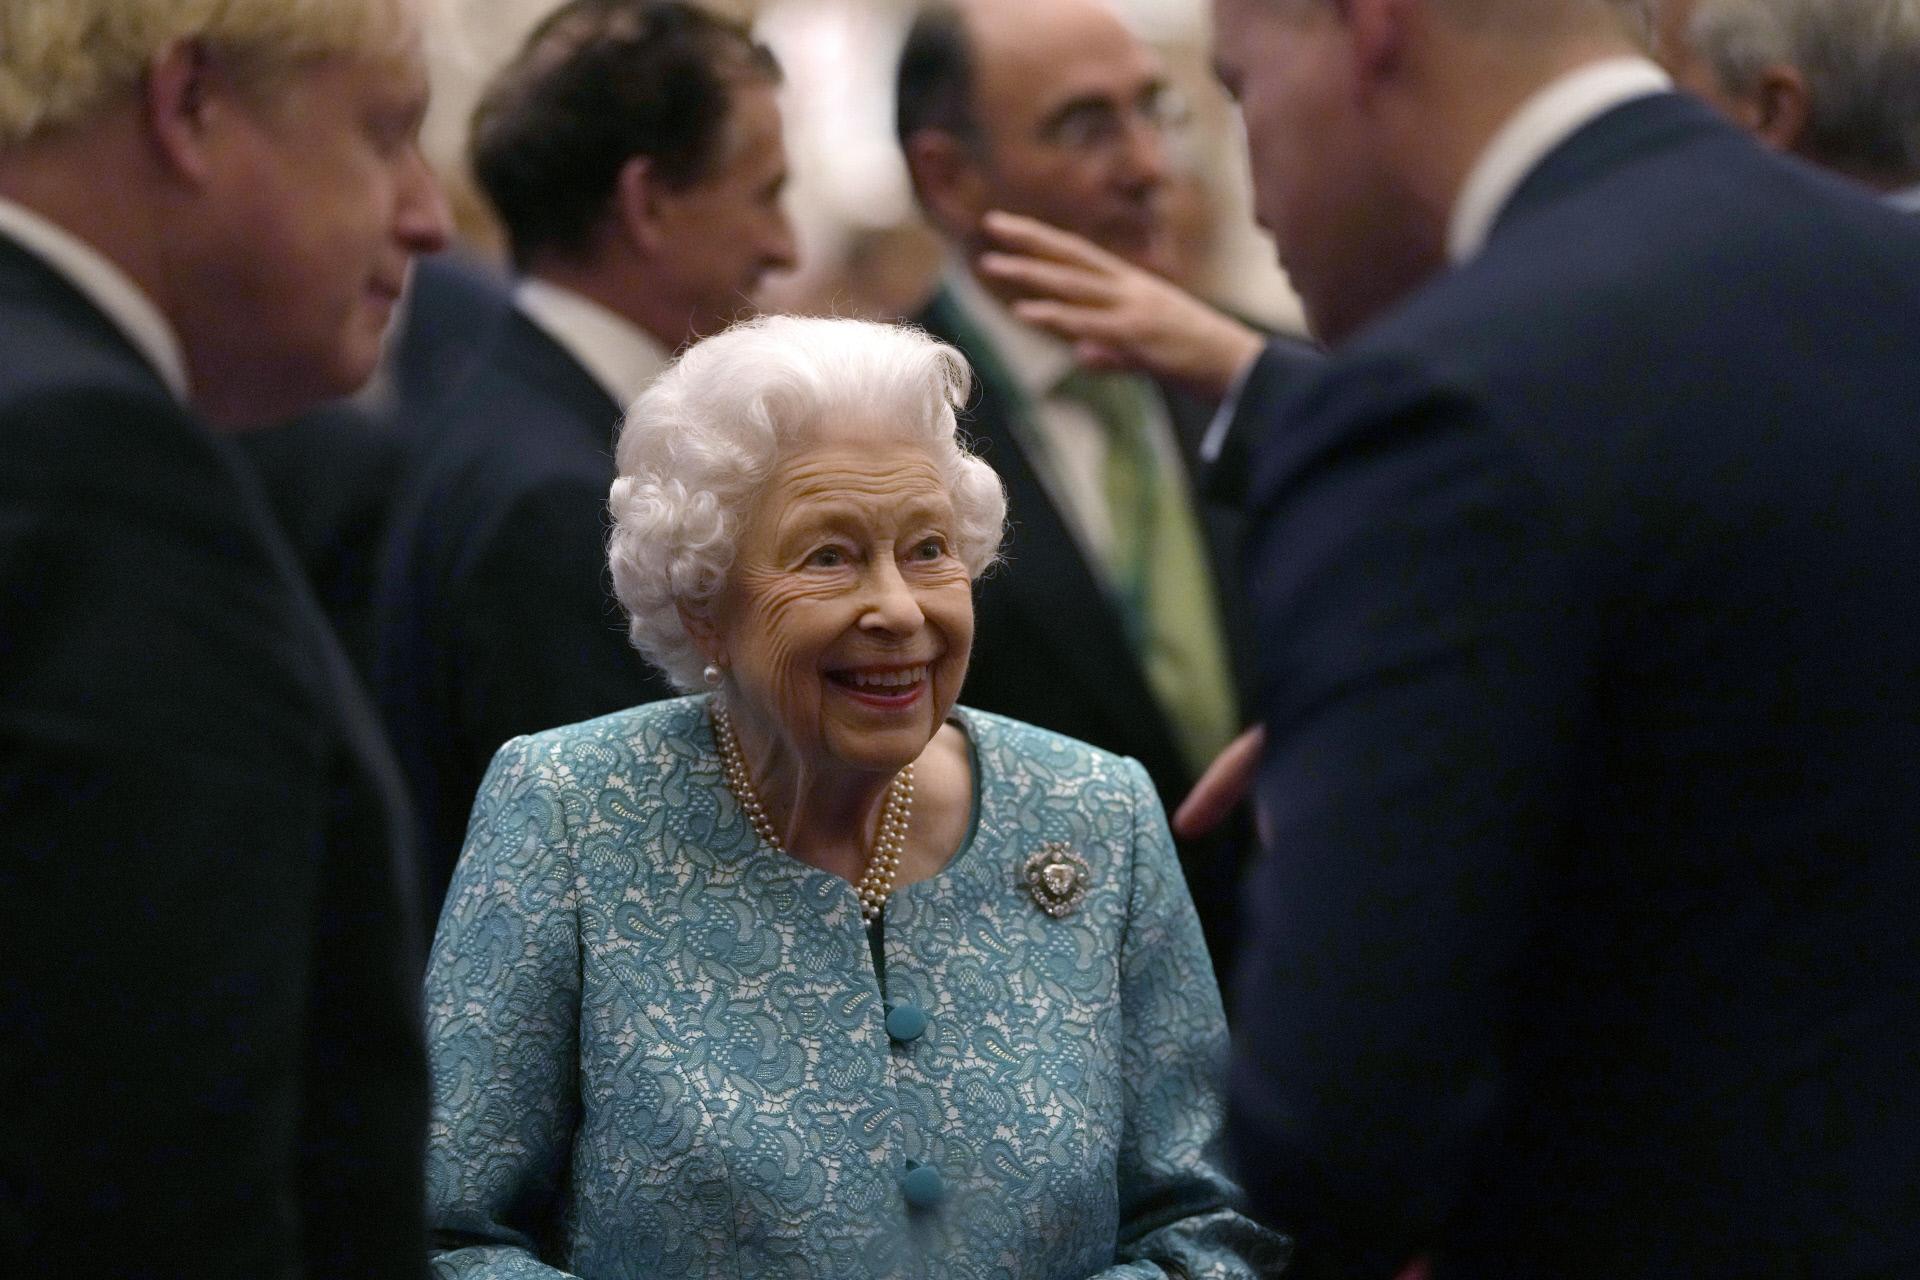 La reina Isabel II, en una imagen reciente.